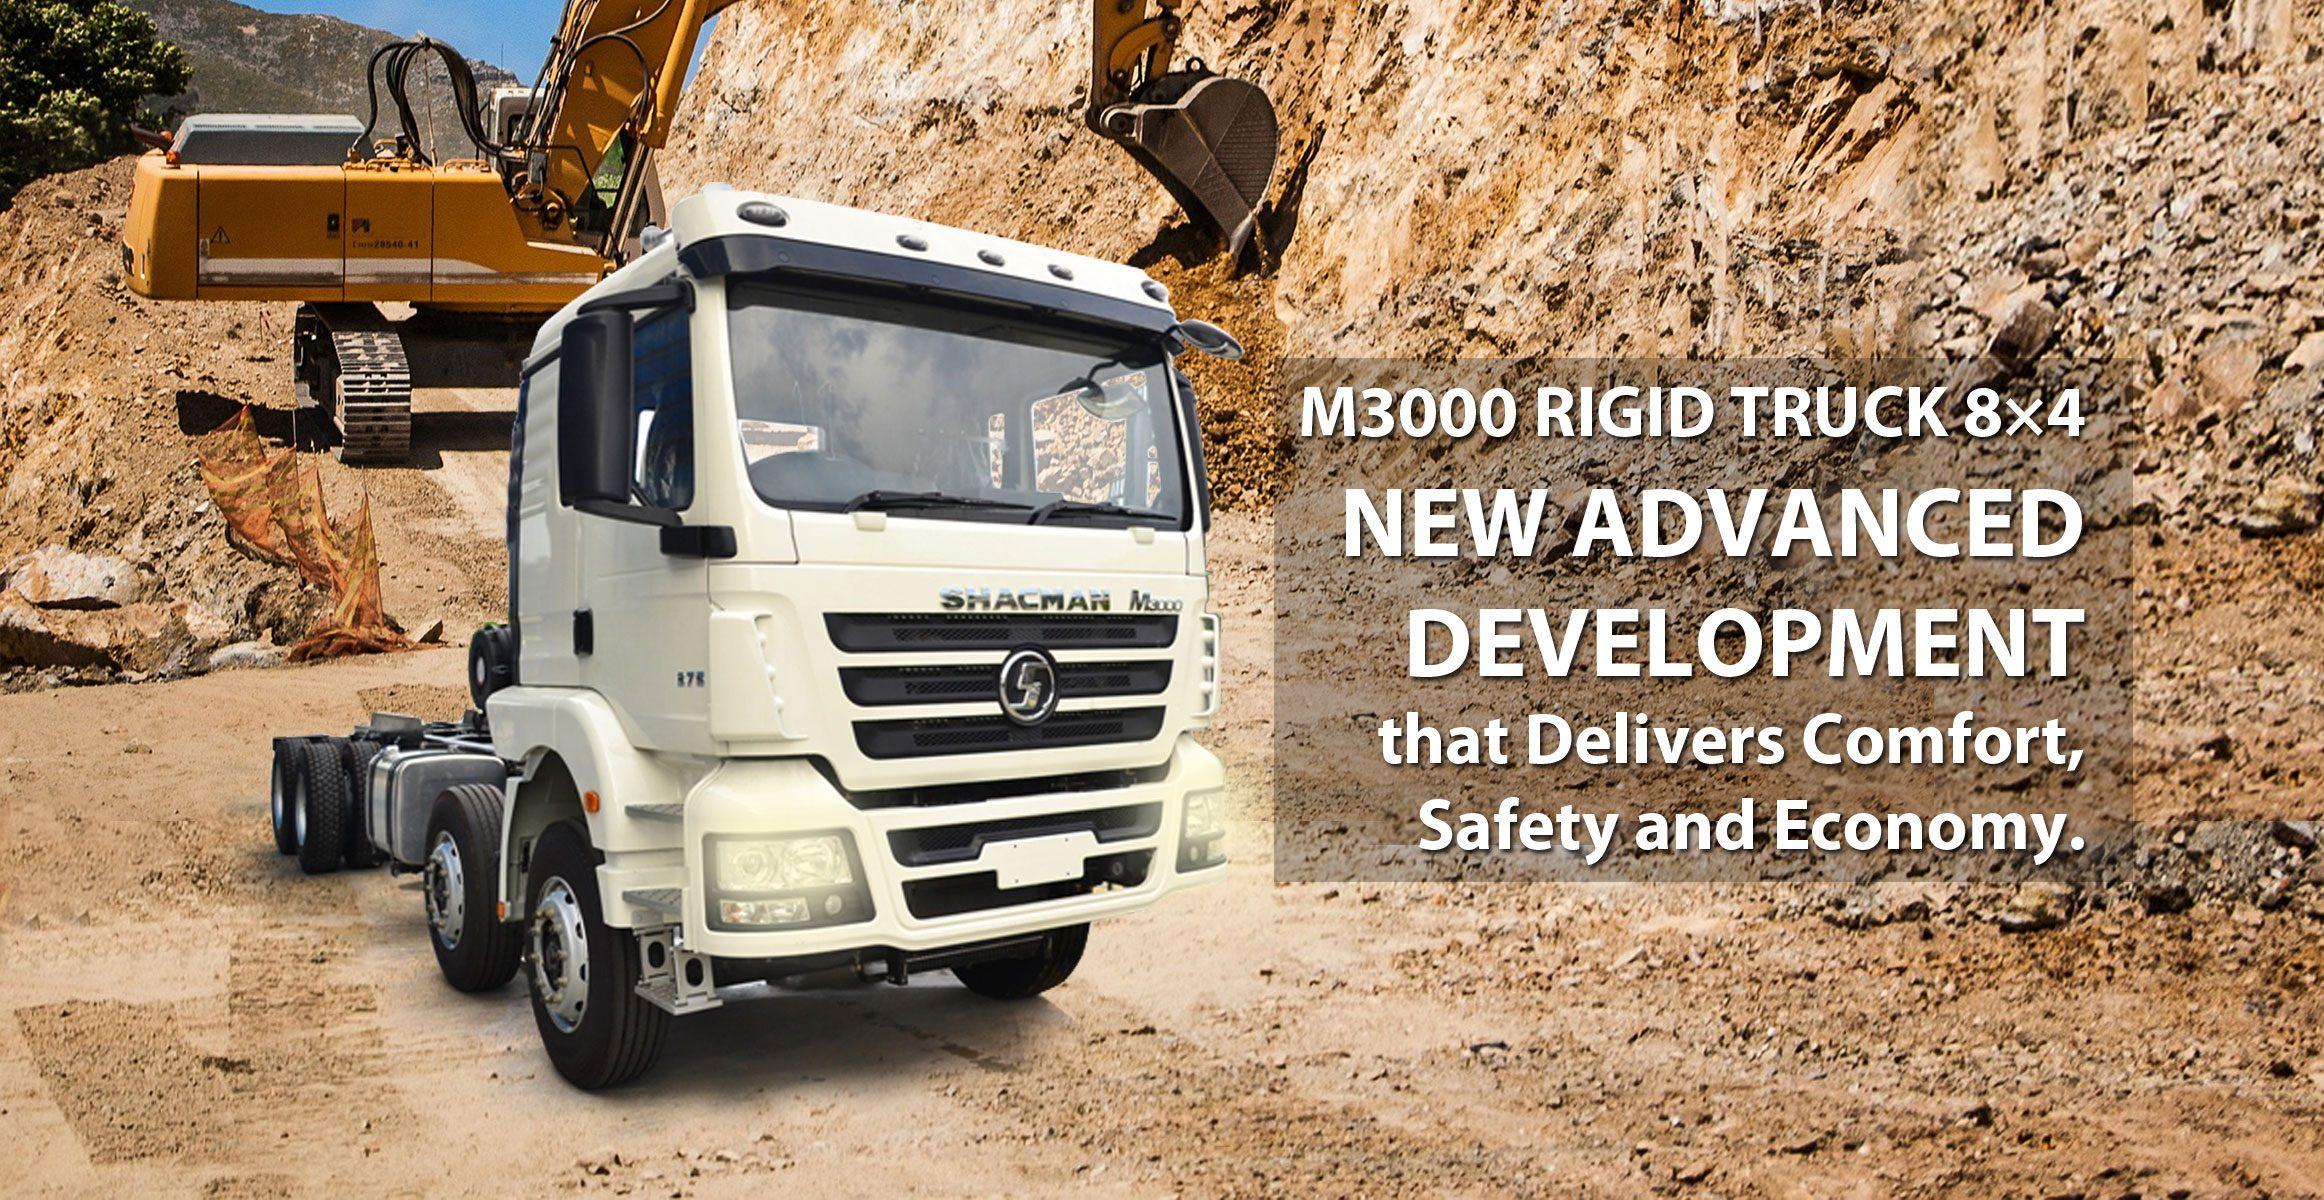 M3000-Rigid-Truck-8x4-lighted